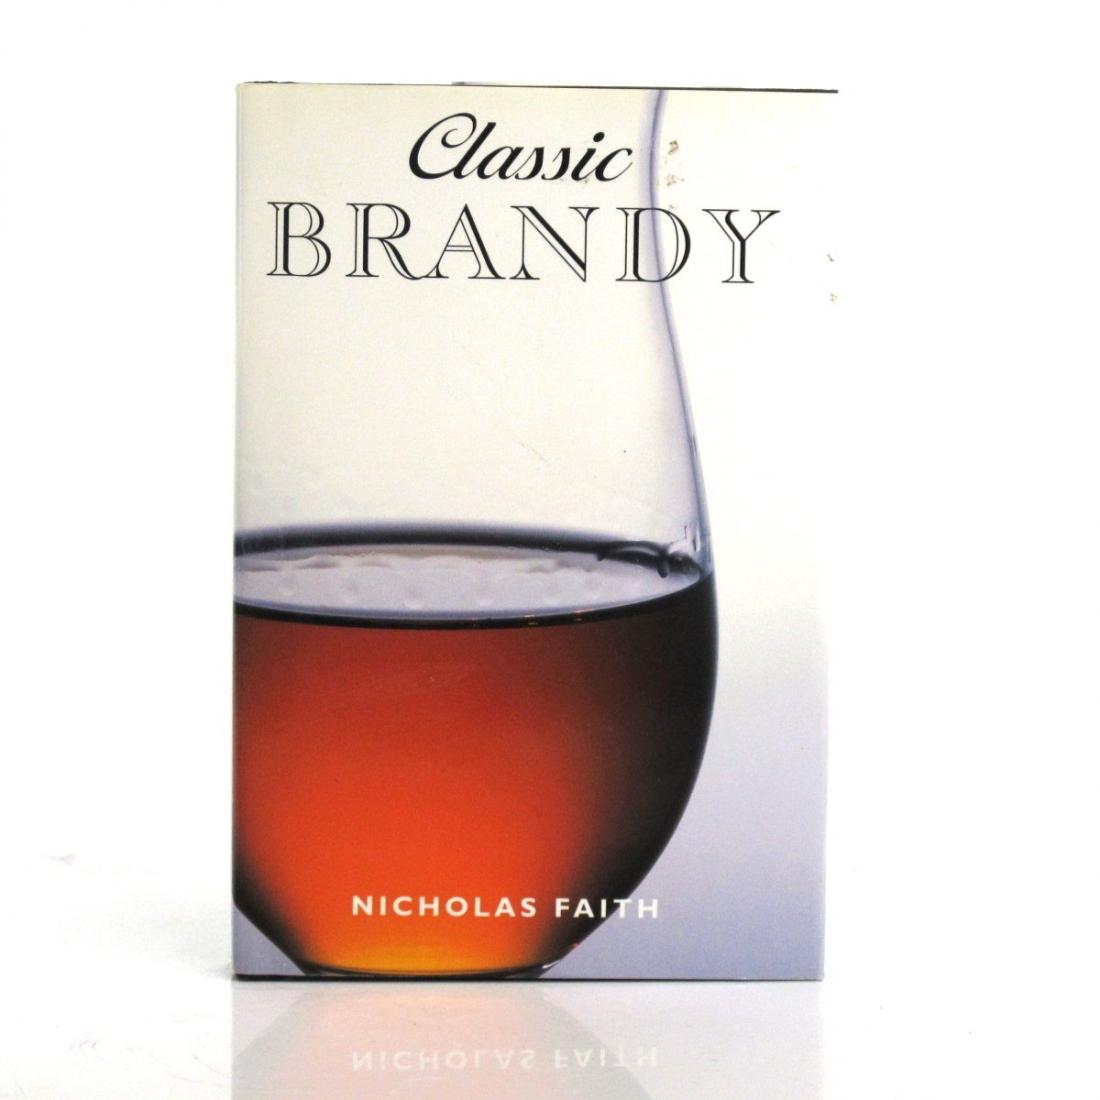 Classic Brandy by Nicholas Faith